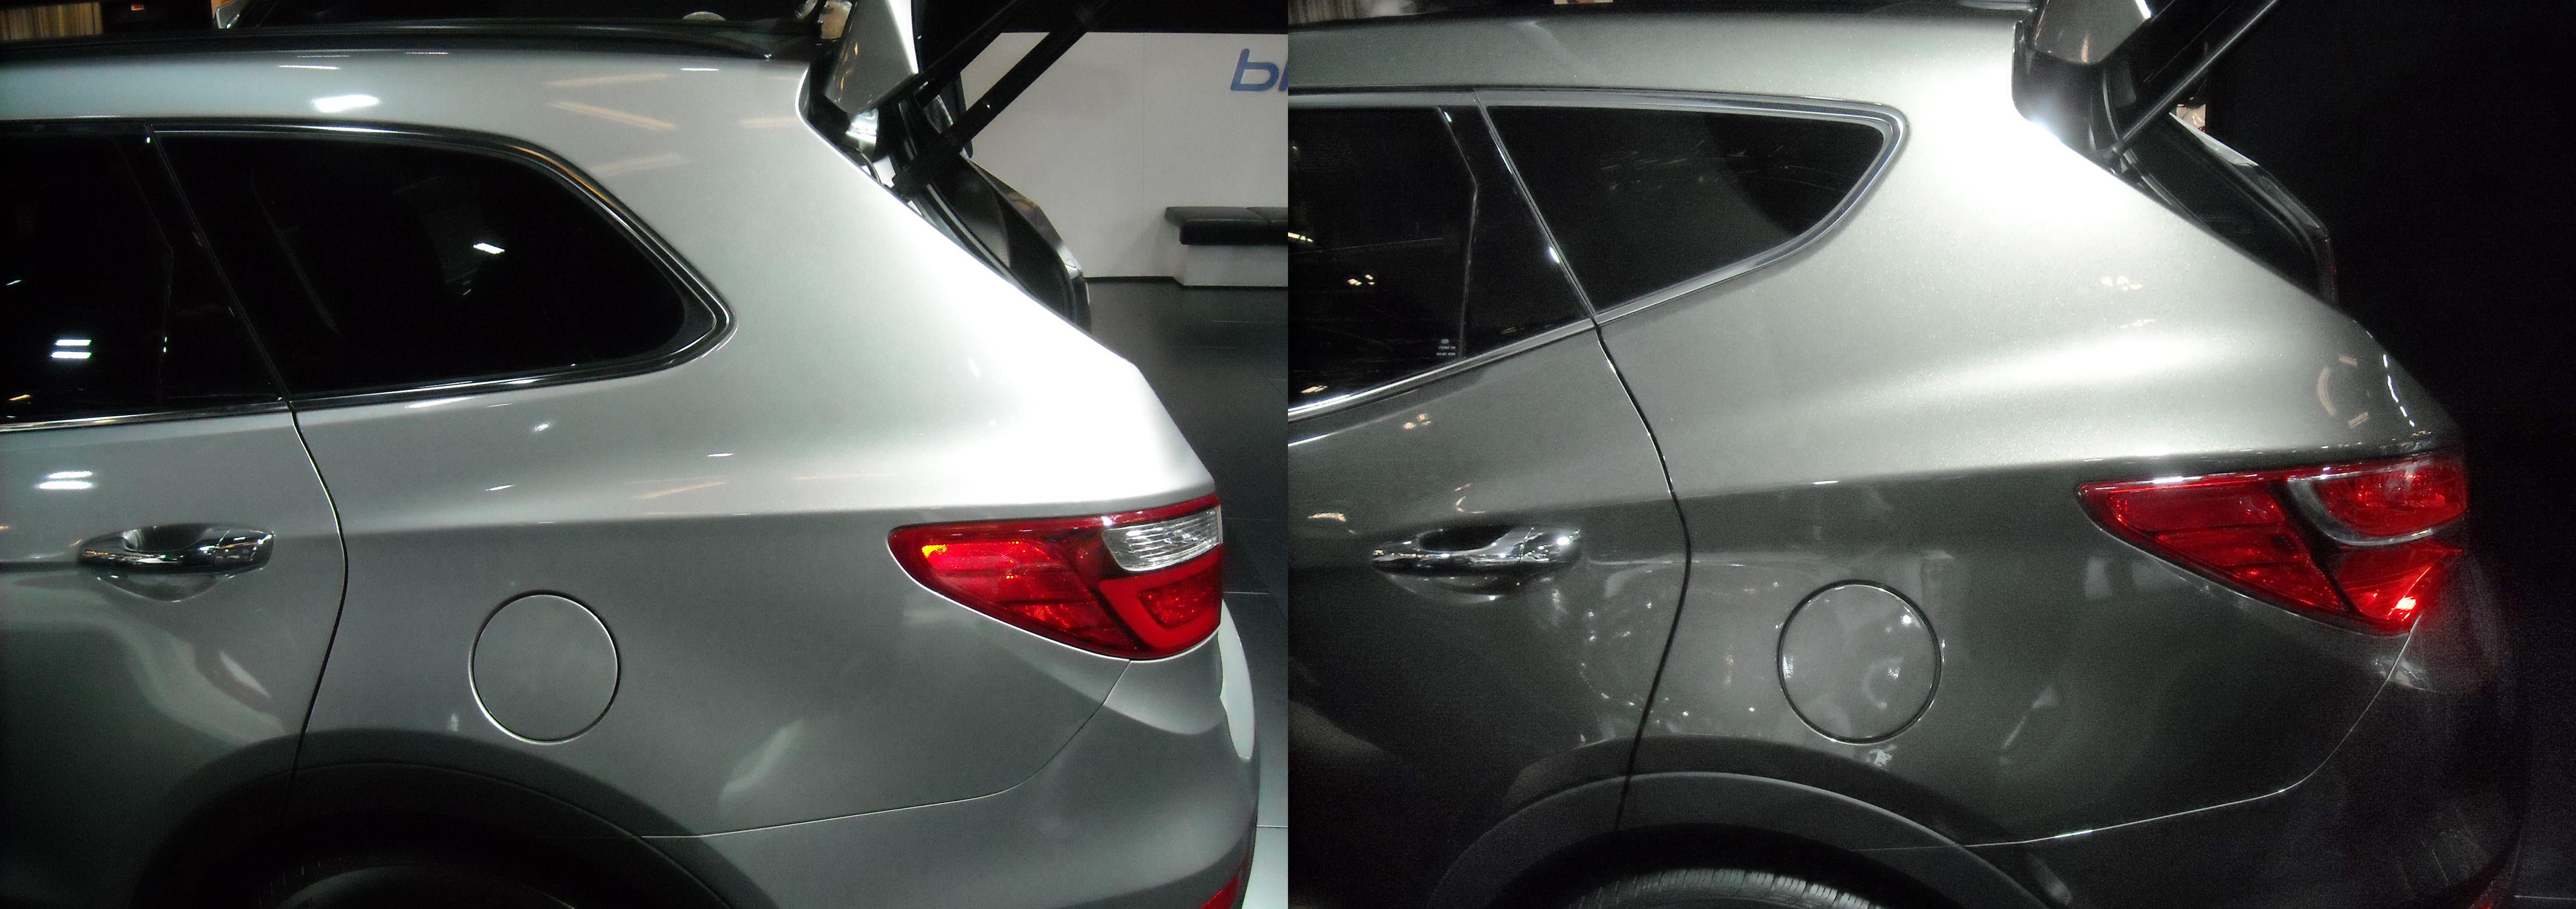 File Hyundai Santa Fe 2013 Platform Comparison Mias Jpg